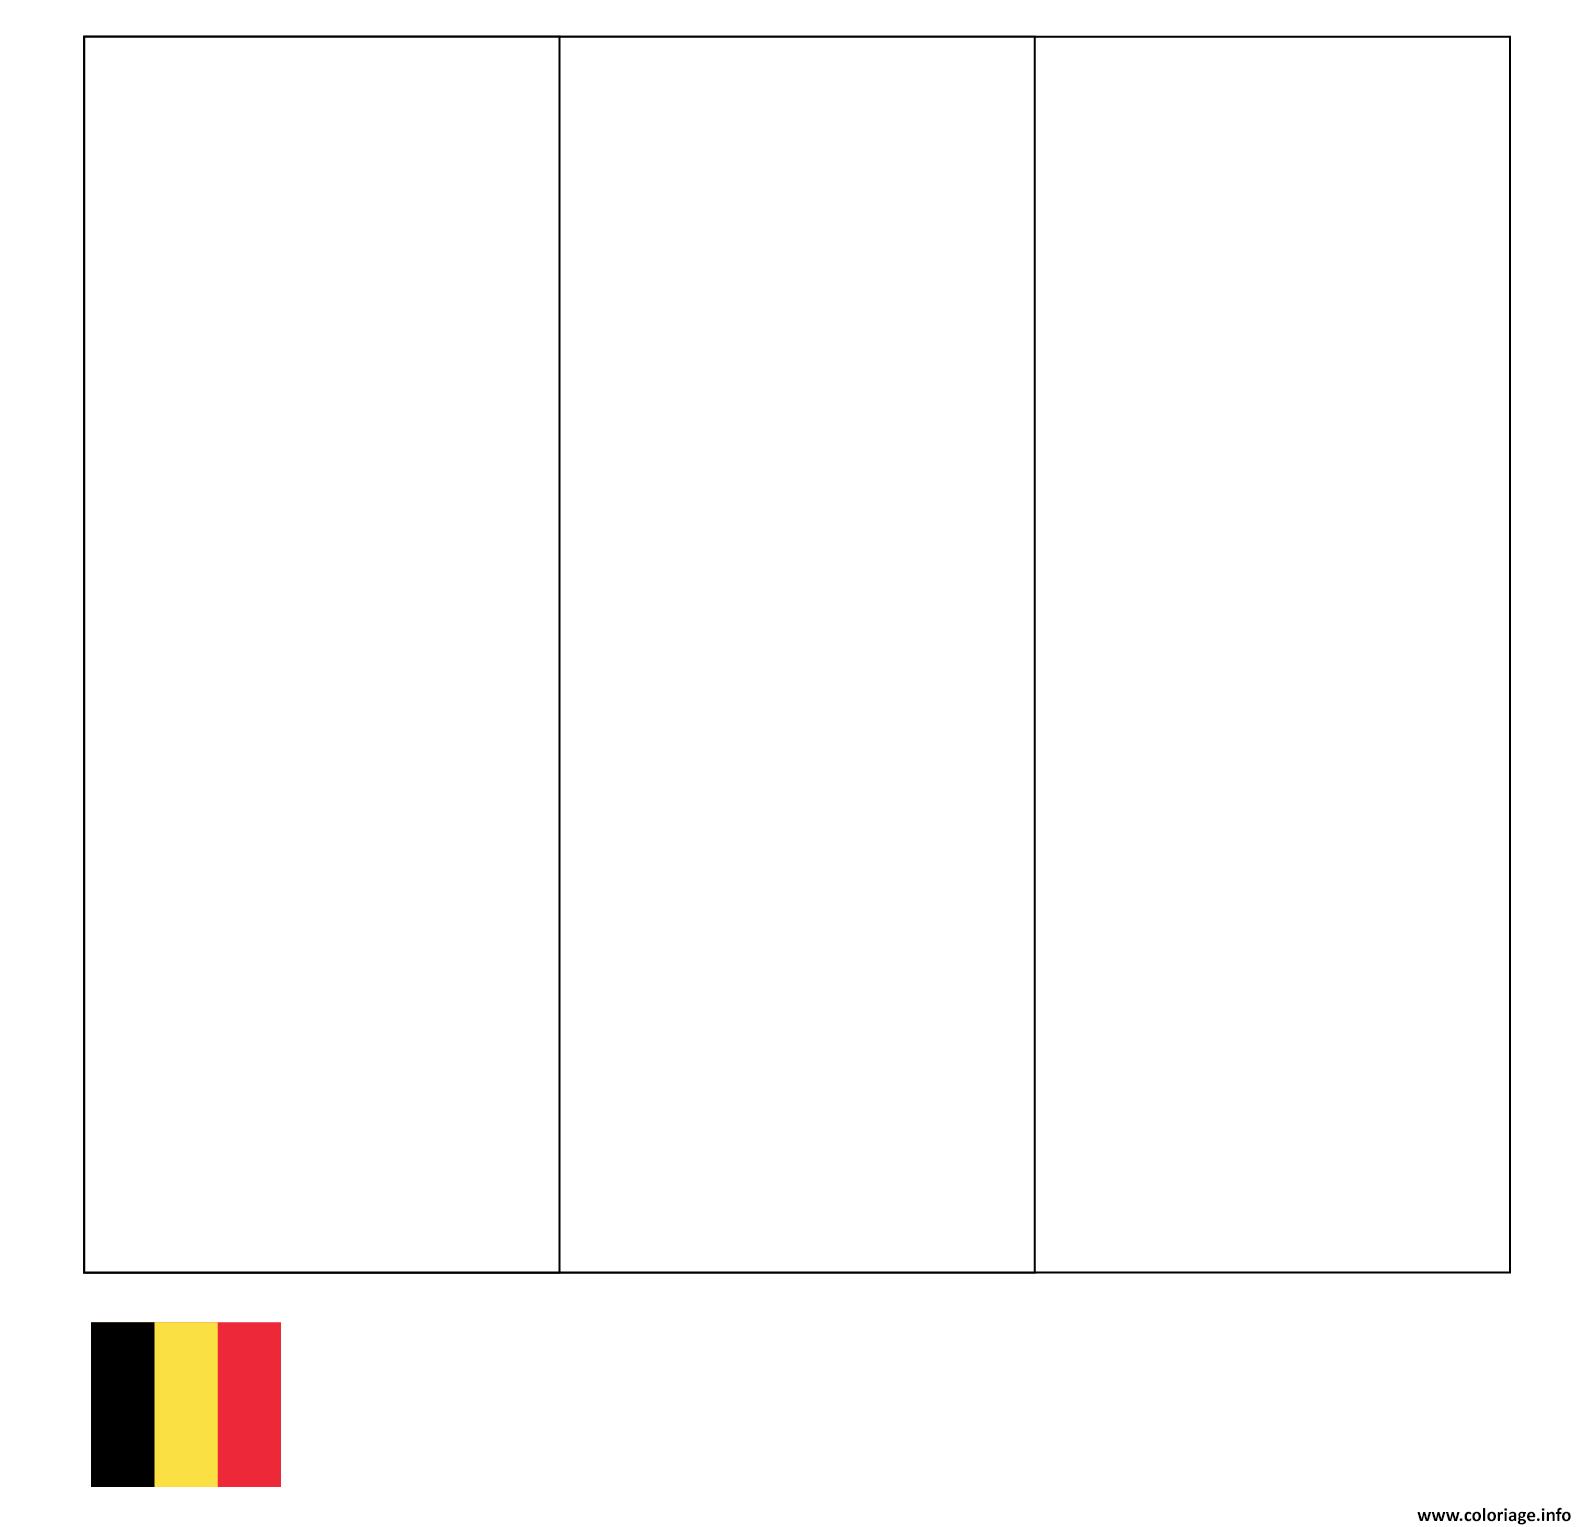 Coloriage Drapeau Belgique dessin